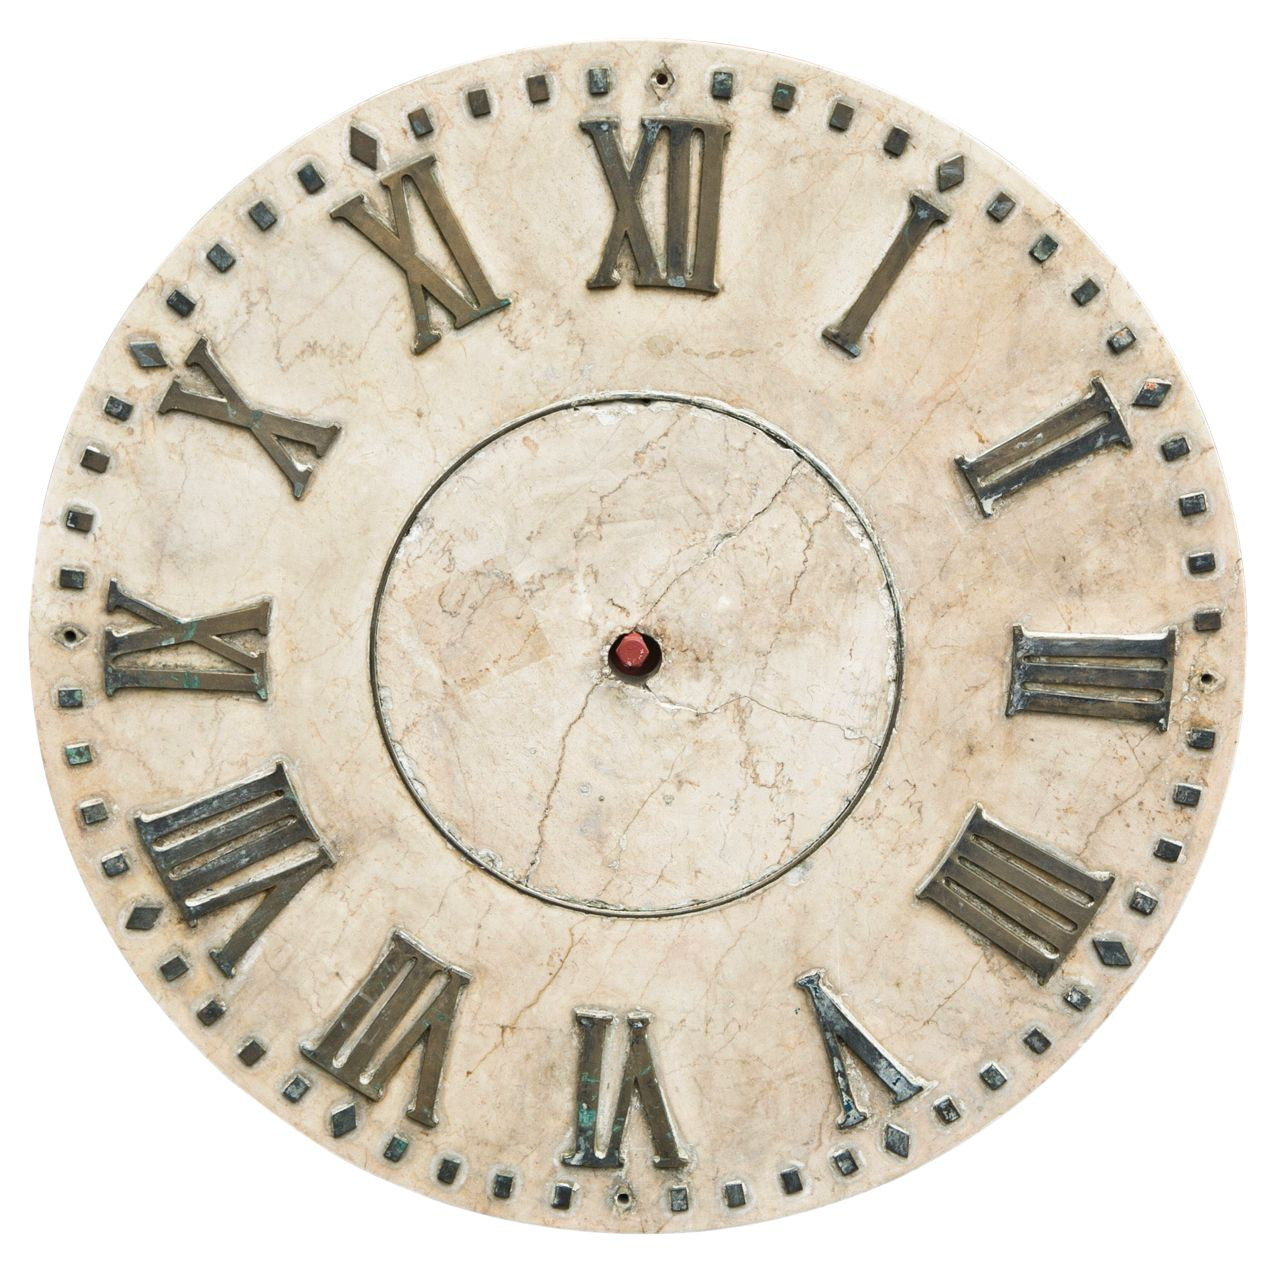 Monumental Skeleton Clock Face | Clock Faces | Clock face